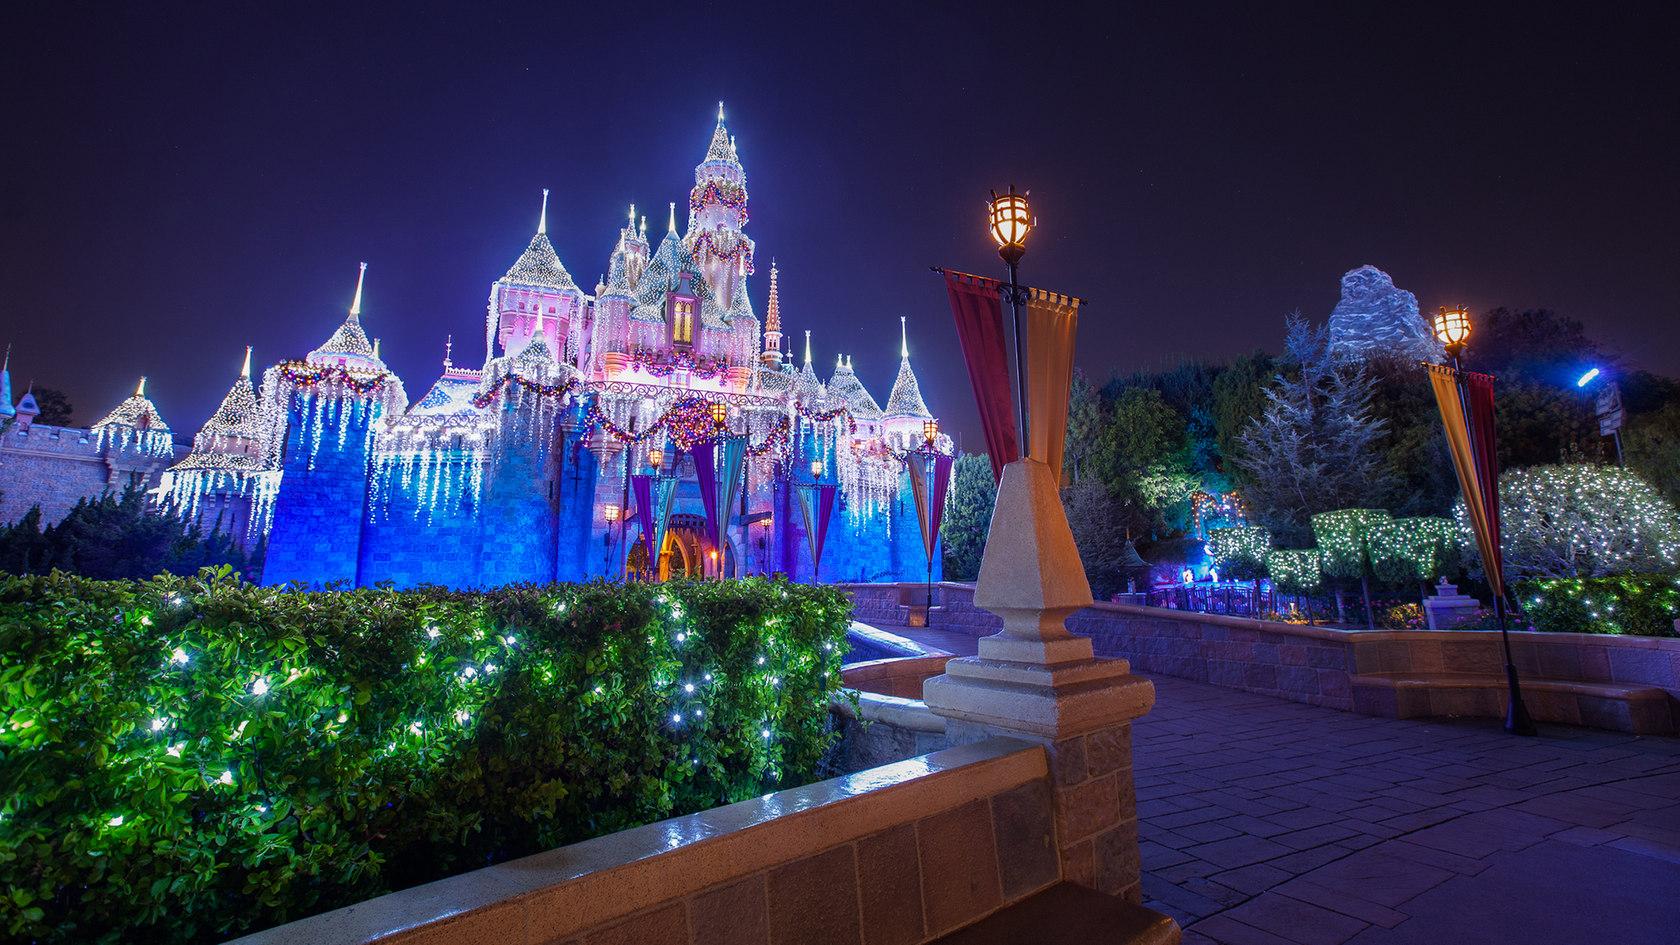 Disney's Sleeping Beauty Castle lit up at nighttime.